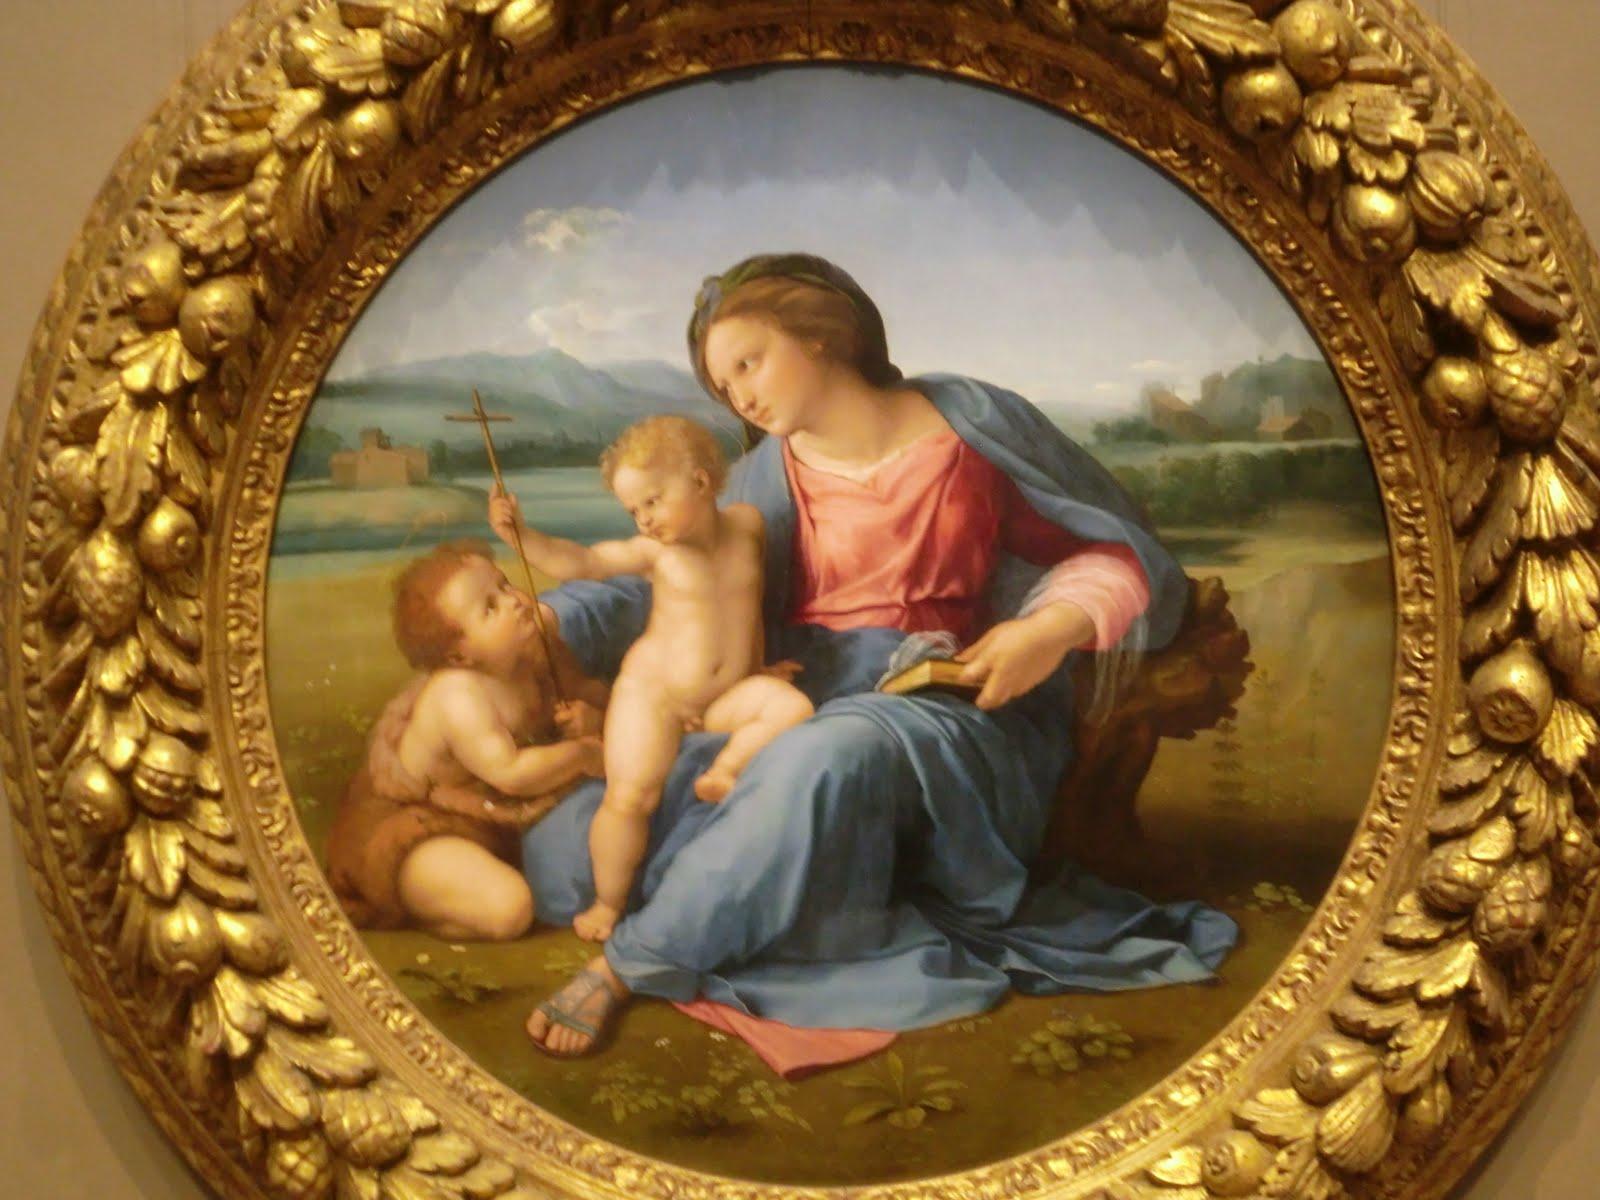 Raphael Sanzio Most Famous Paintings Raffaello sanzio da urbino Famous Angel Paintings Raphael